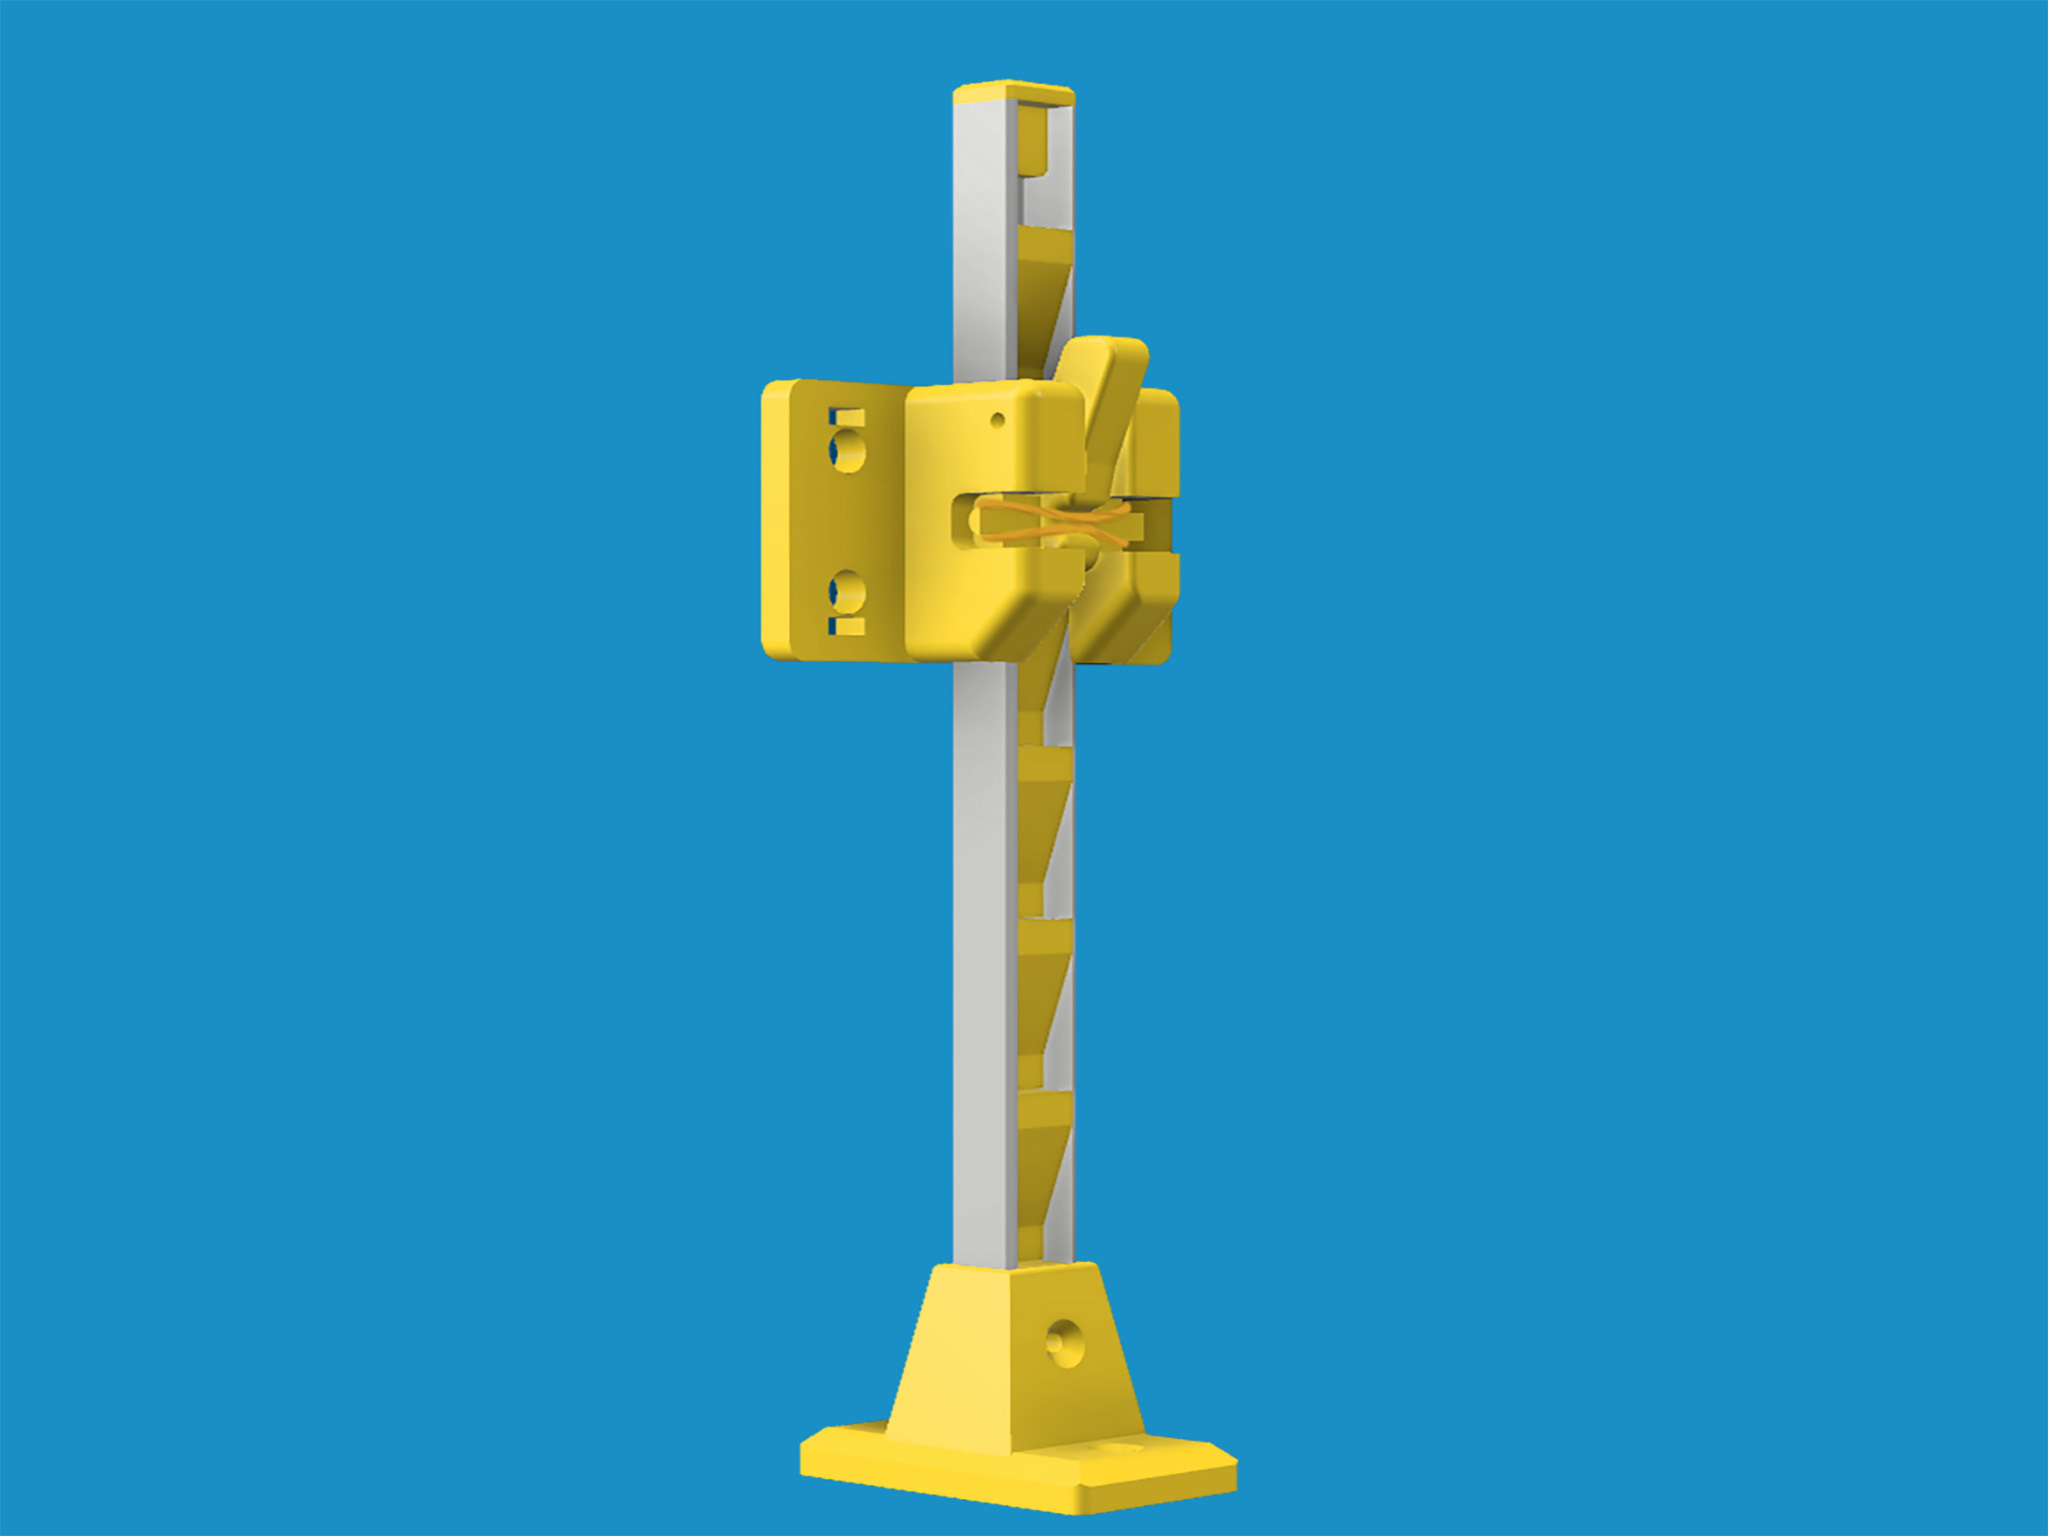 Foto3.jpg Download free STL file Laser Lifting Feet • 3D printing template, dancingchicken